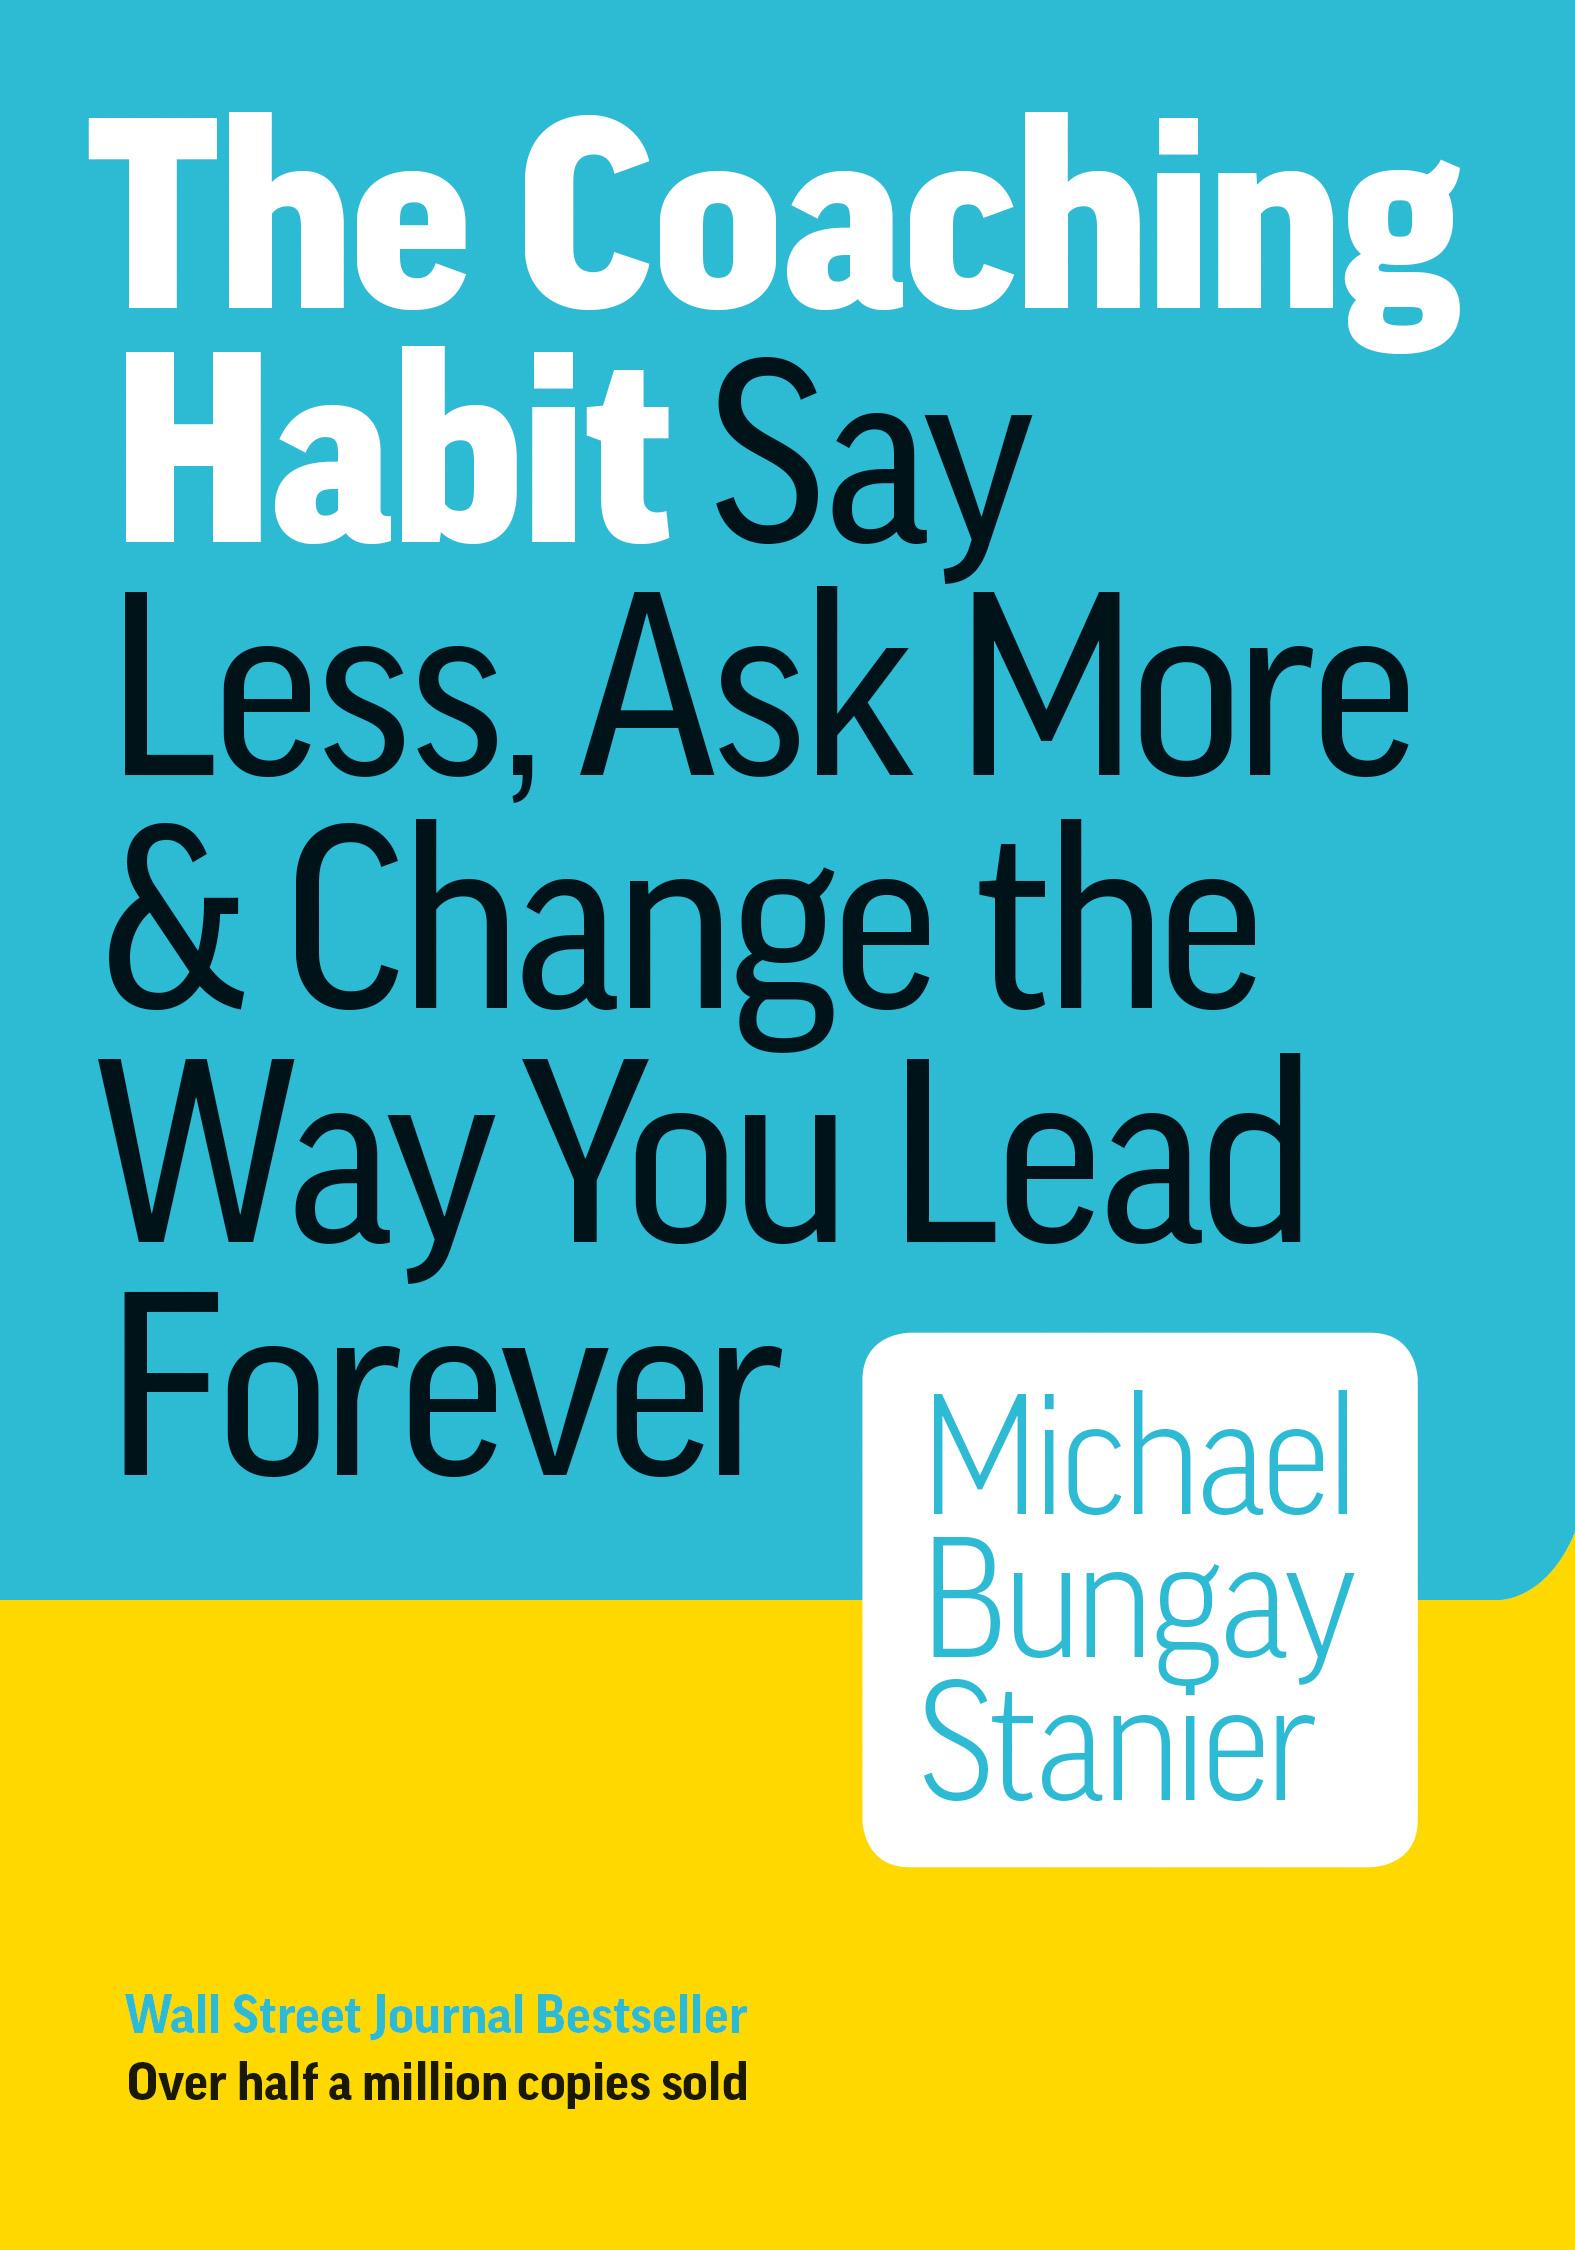 Michael Bungay Stanier The Coaching Habit